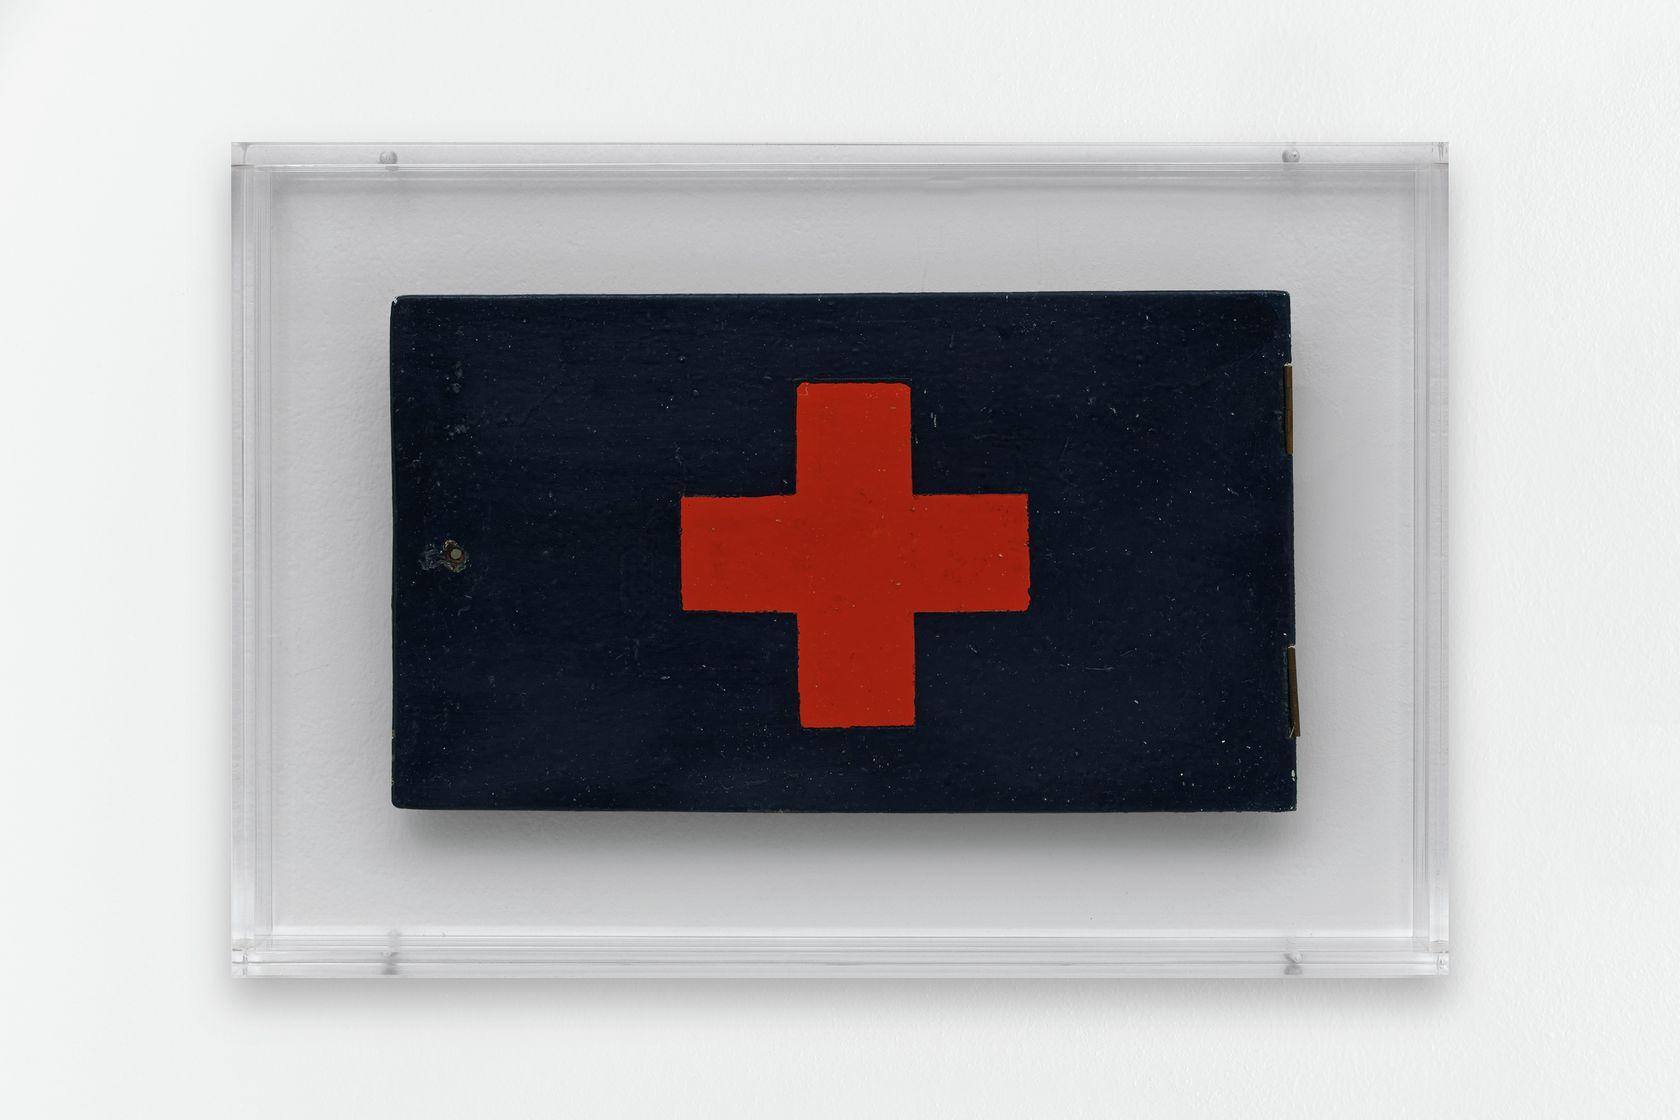 Ernest T., Infirmerie, 1972 Peinture laquée sur boisBoîte en plexiglas 28 × 41 × 6 cm / 11  × 16 1/8 × 2 3/8 in. (encadré/framed)